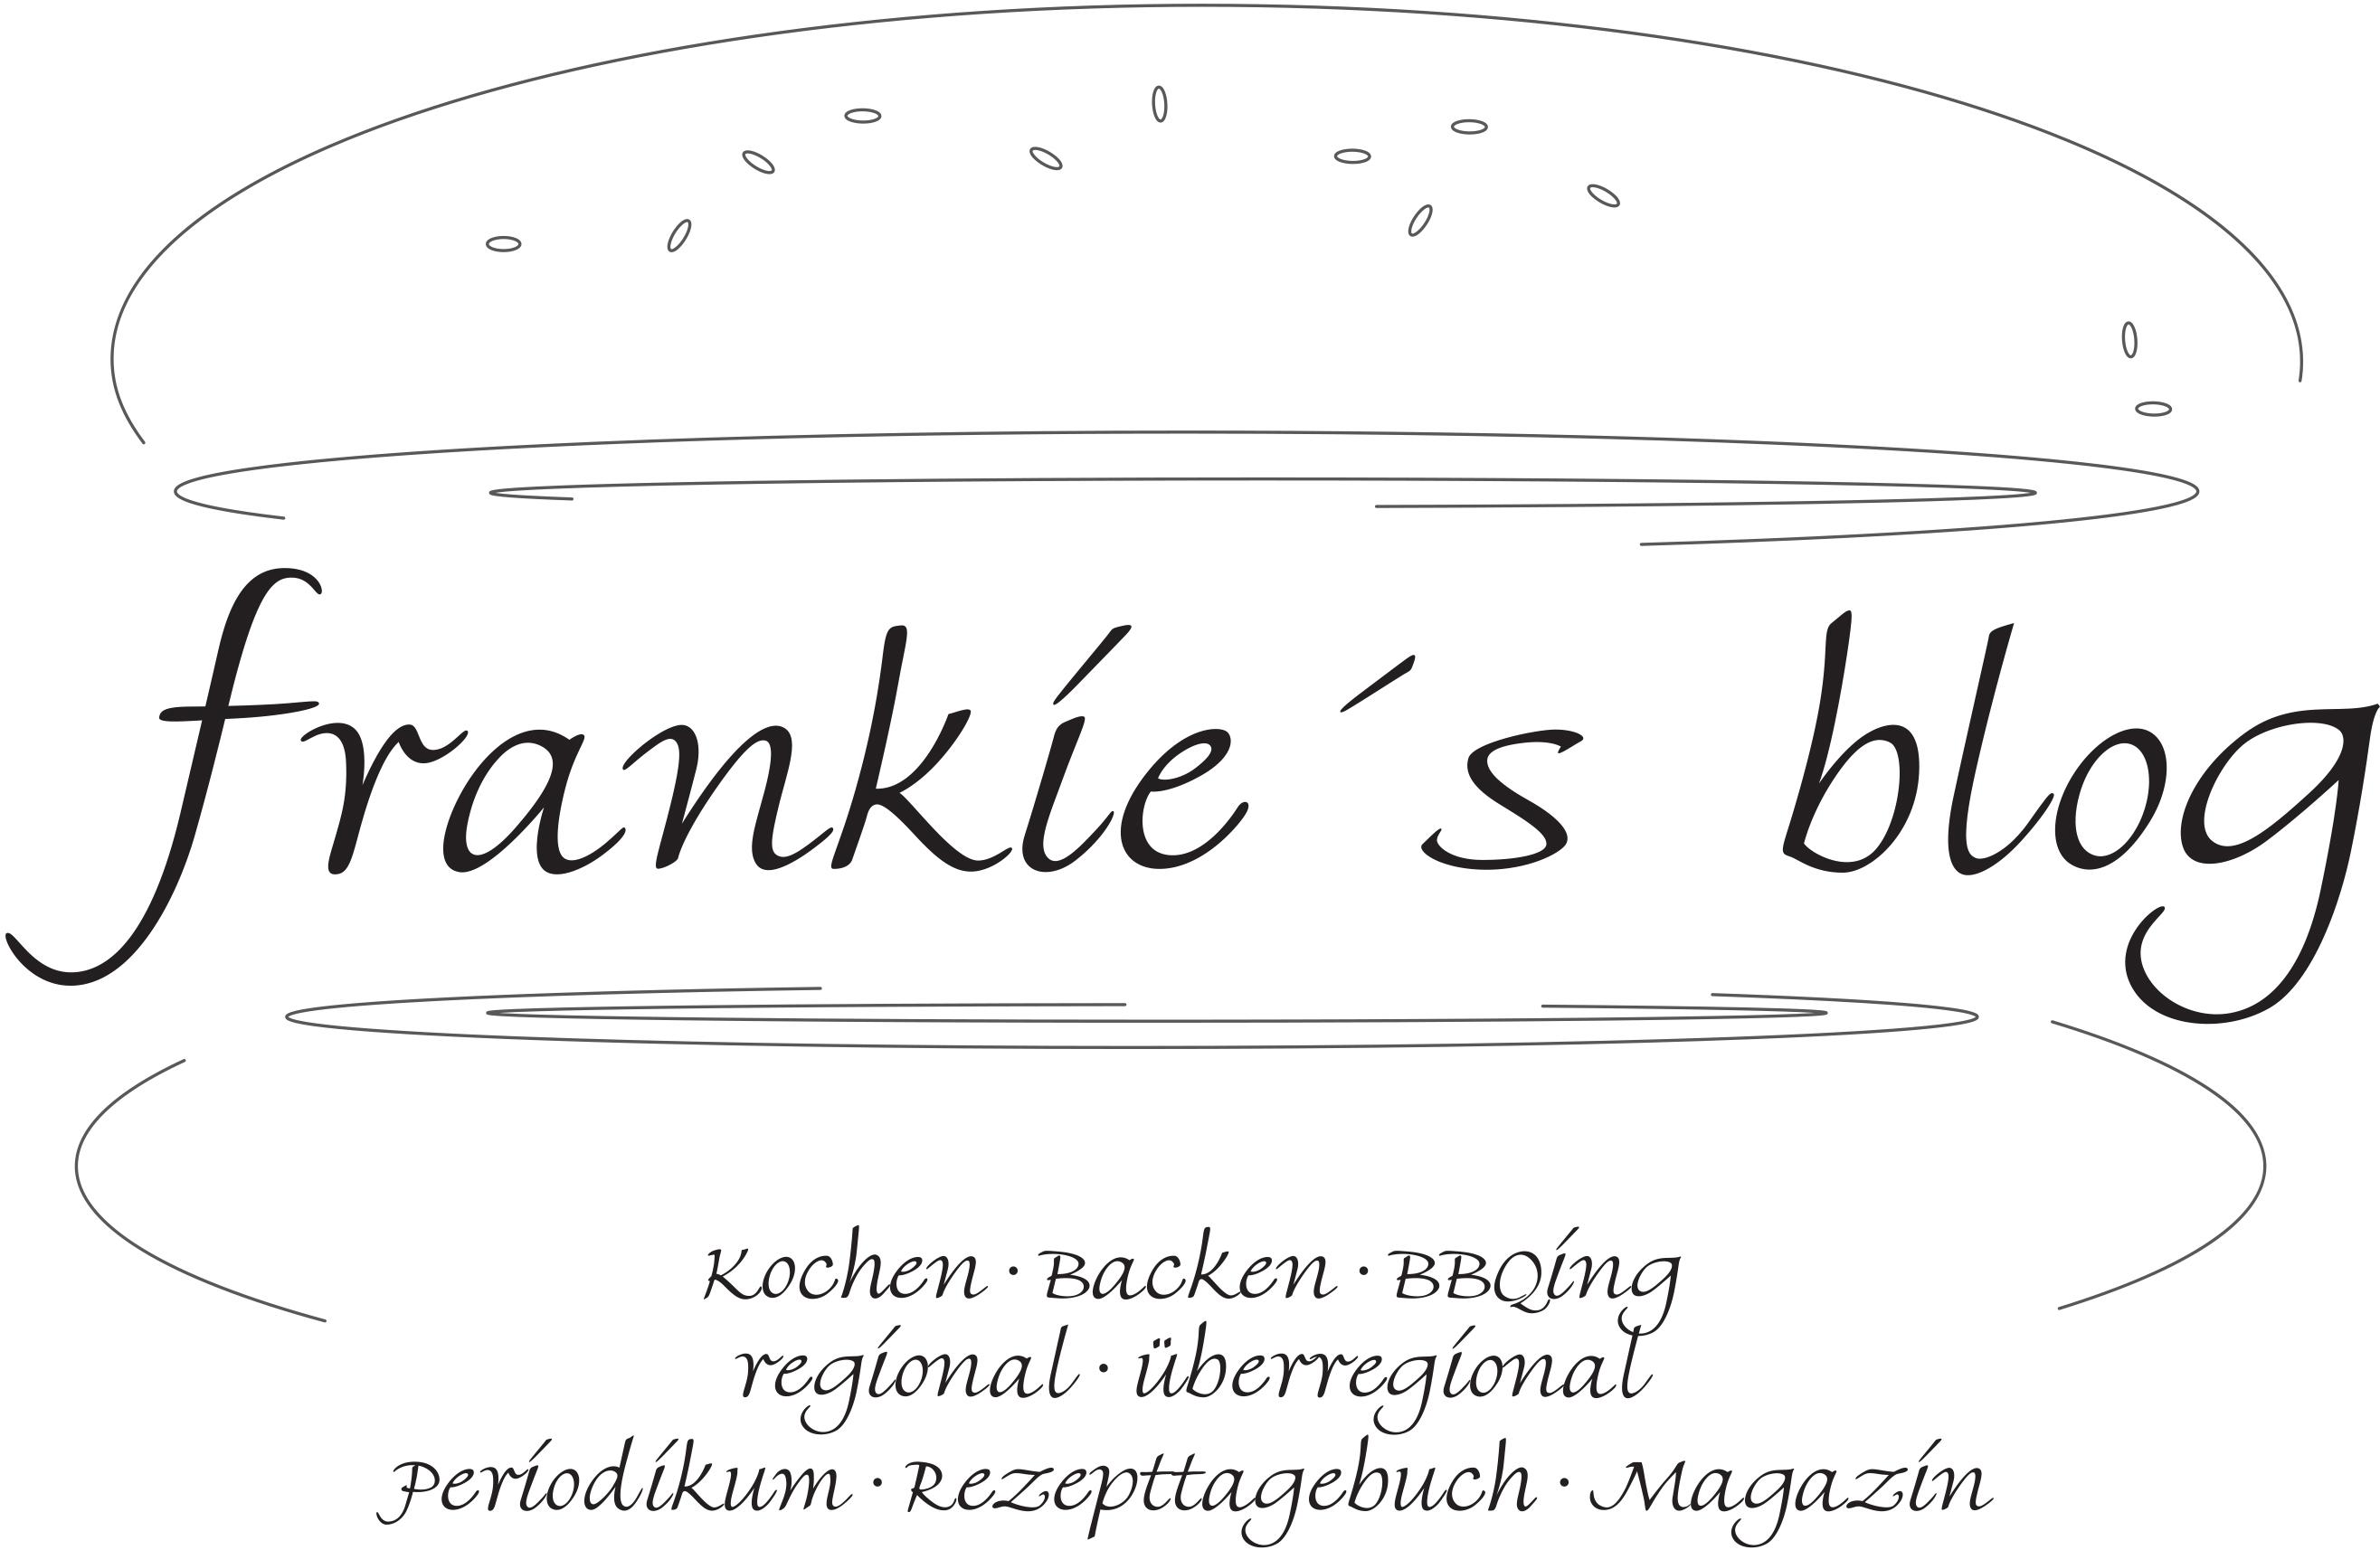 frankiesblog